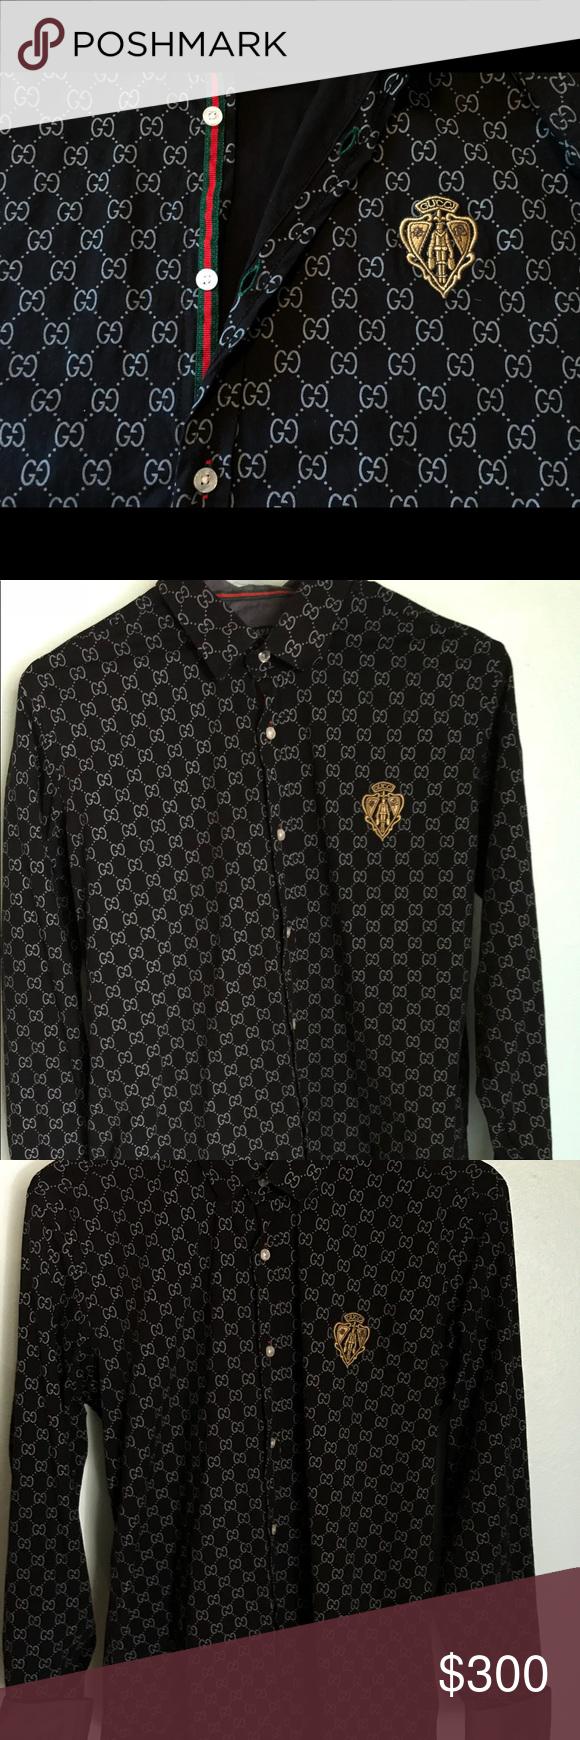 066a305d Gucci Mens/Unisex Button Up Shirt Black / M Slim Black Gucci Men's long  sleeve